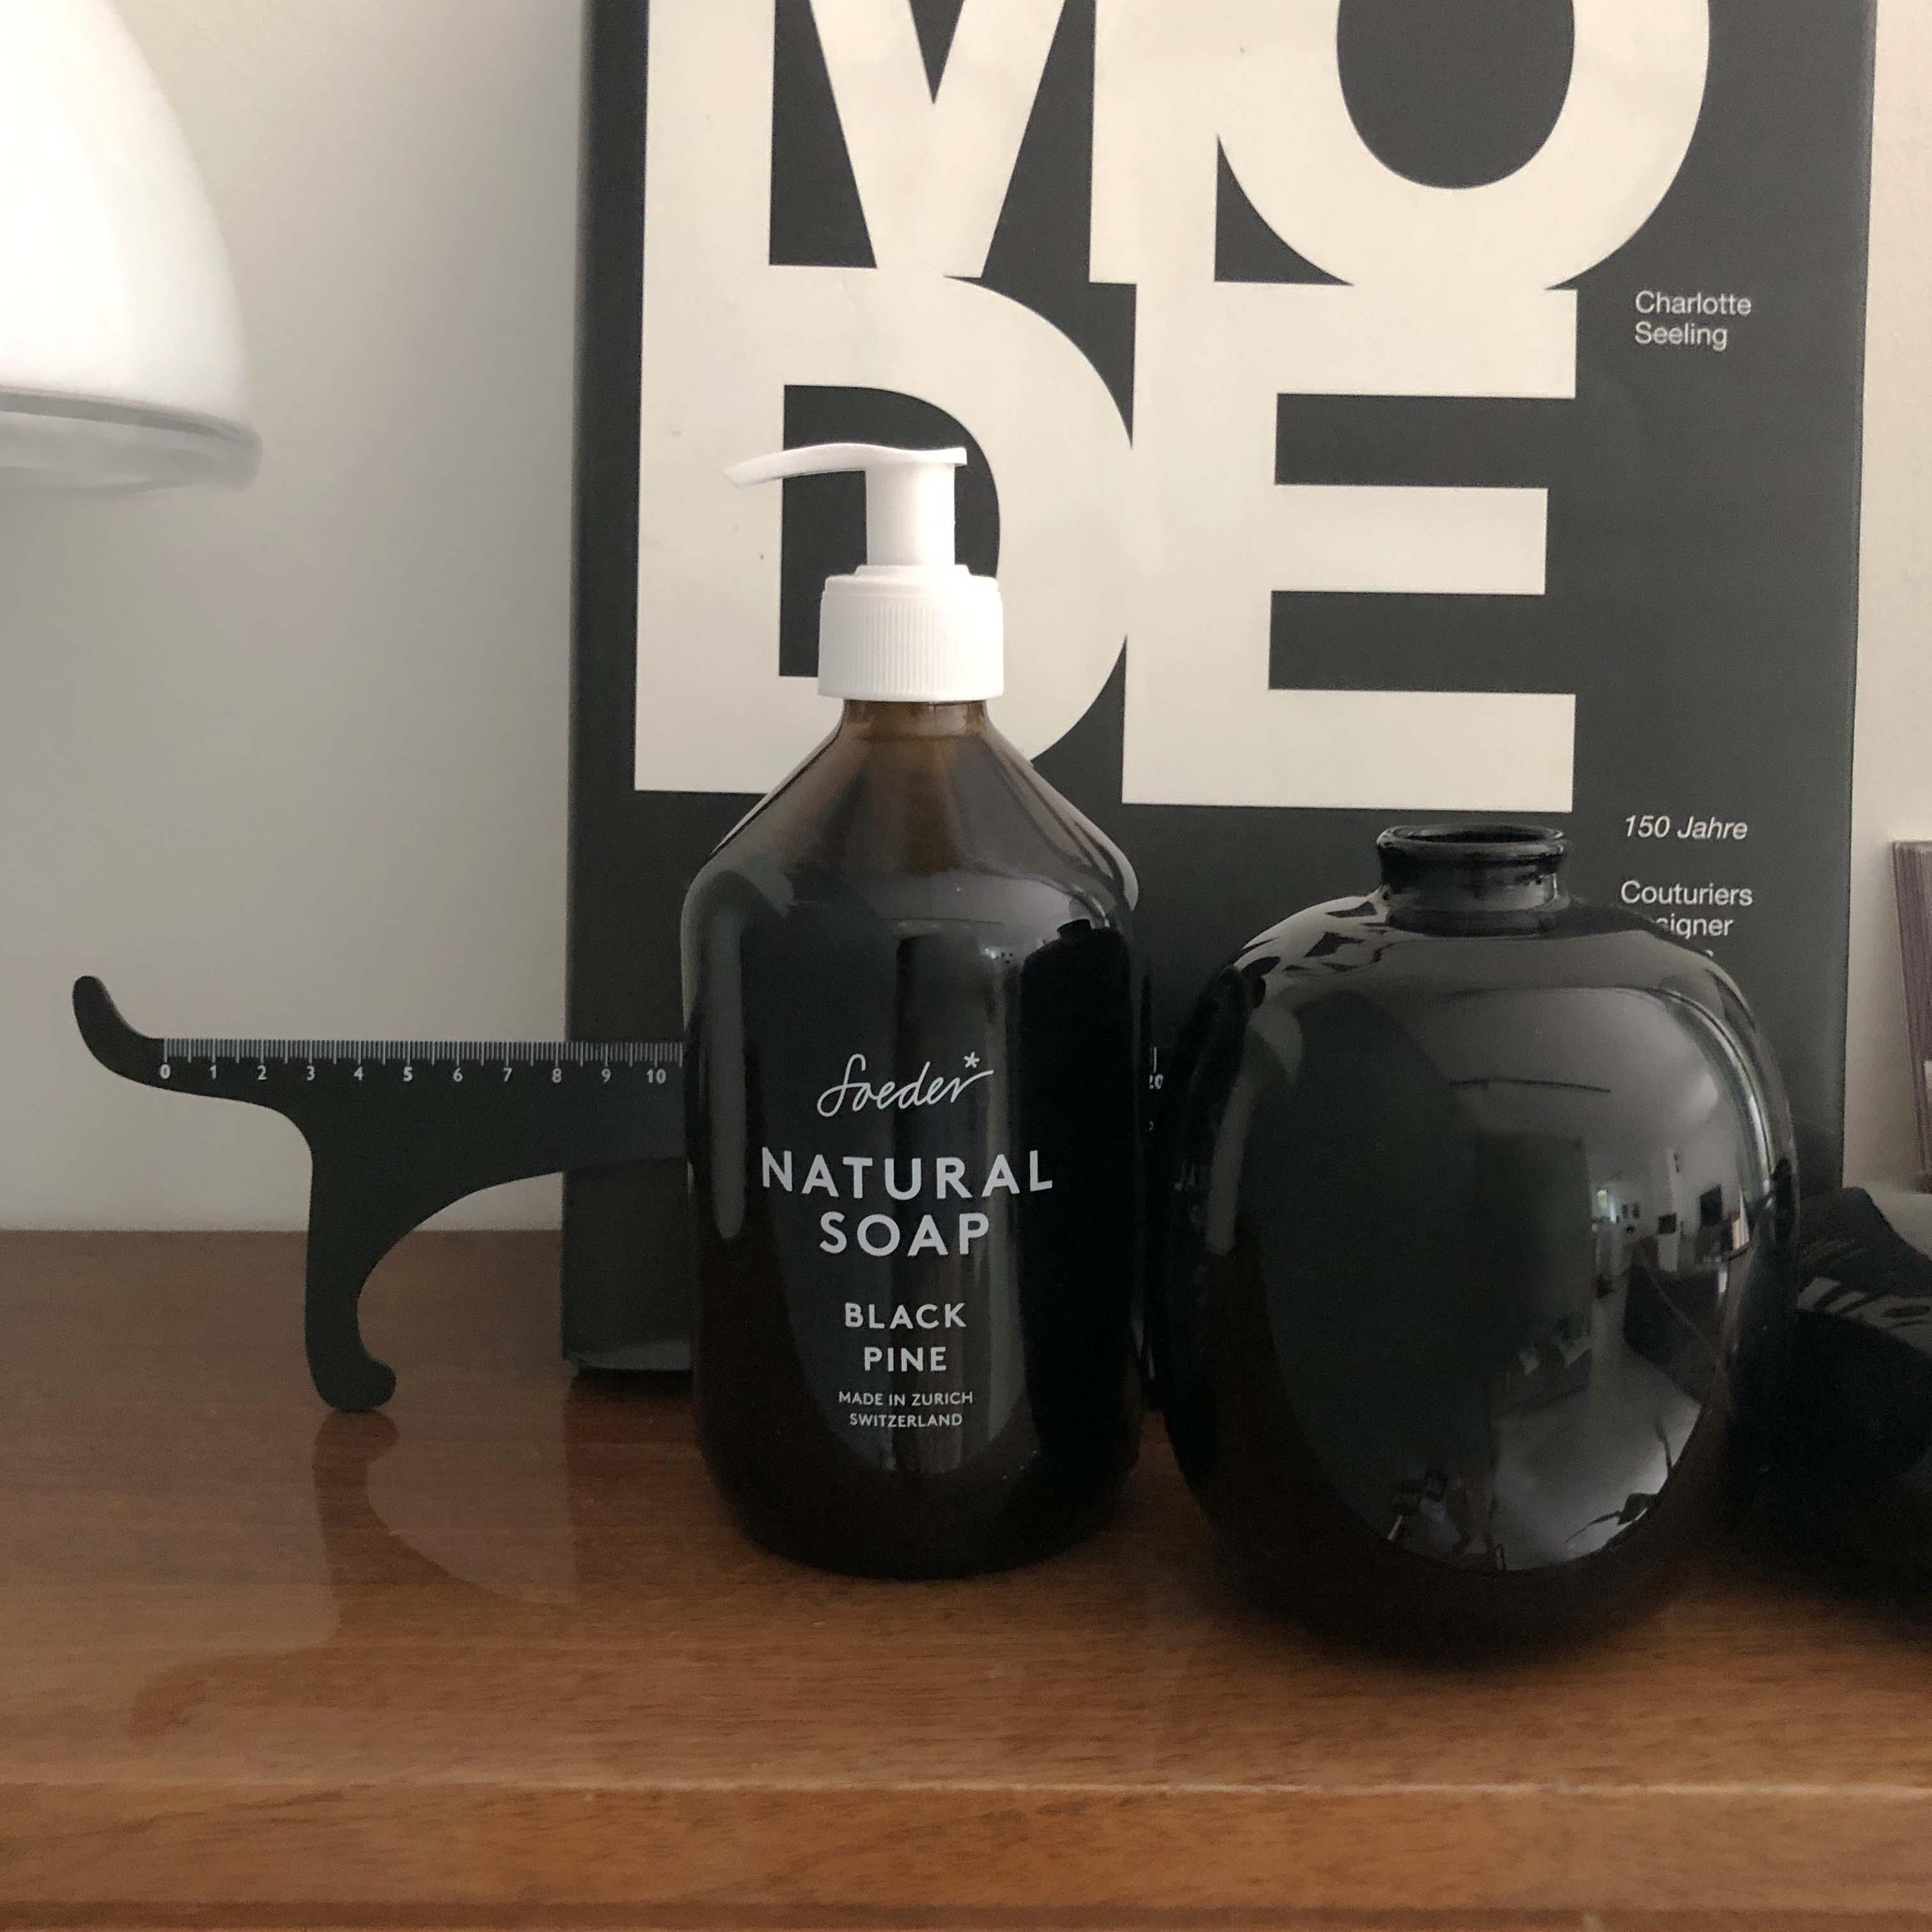 Natural Soap - Black Pine 250 ml von soeder*